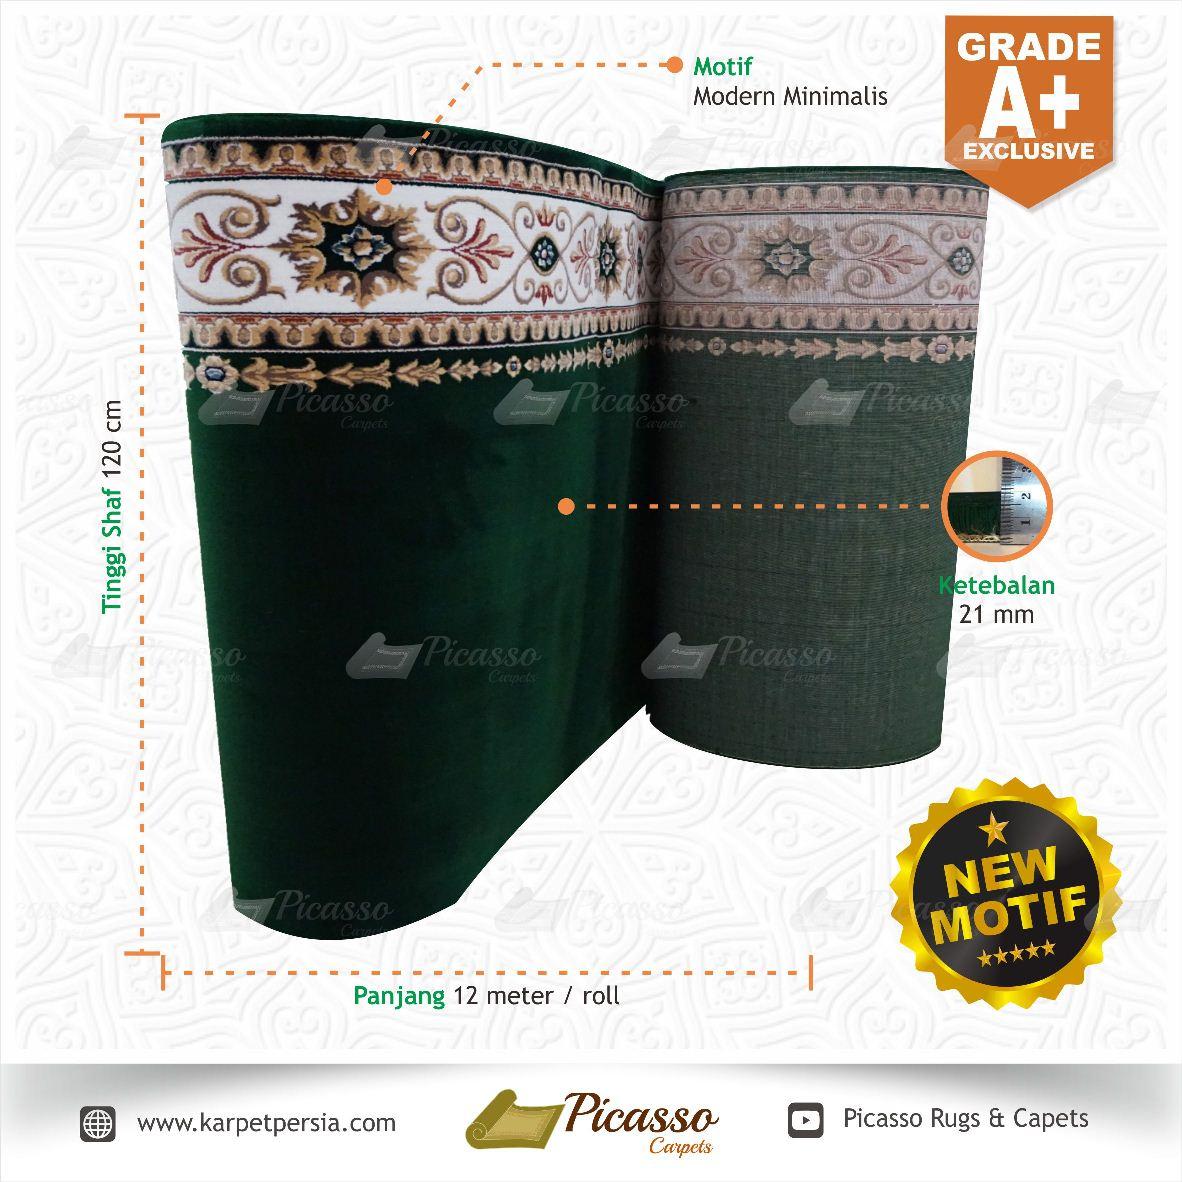 Karpet Masjid Grade A+ Exclusive